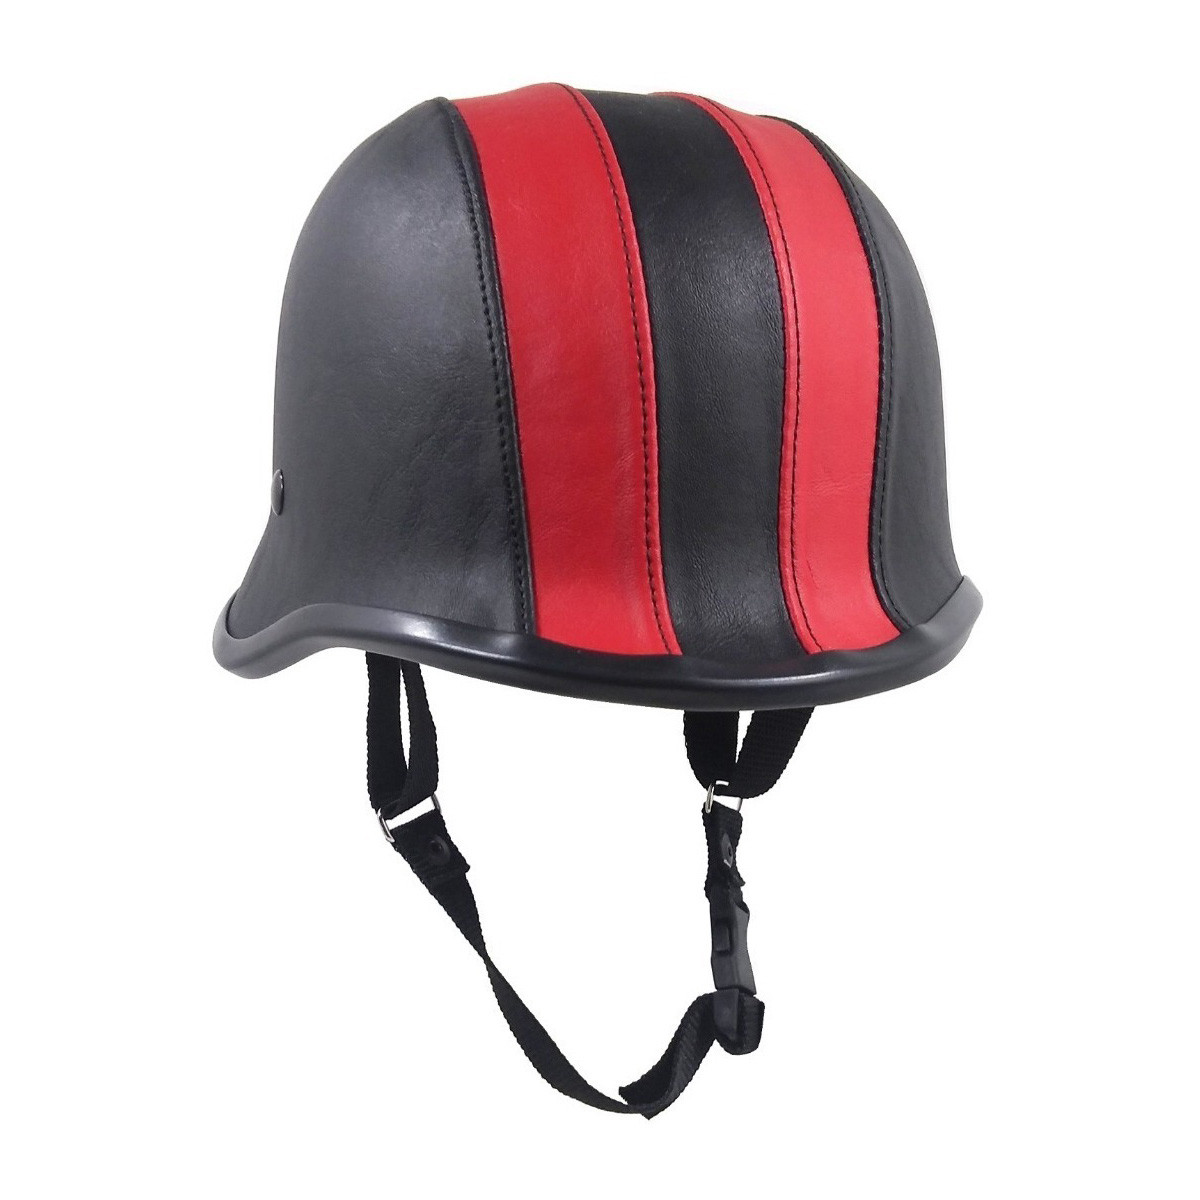 Casco Abierto Chopper Custom Aleman Rojo Negro Cuero